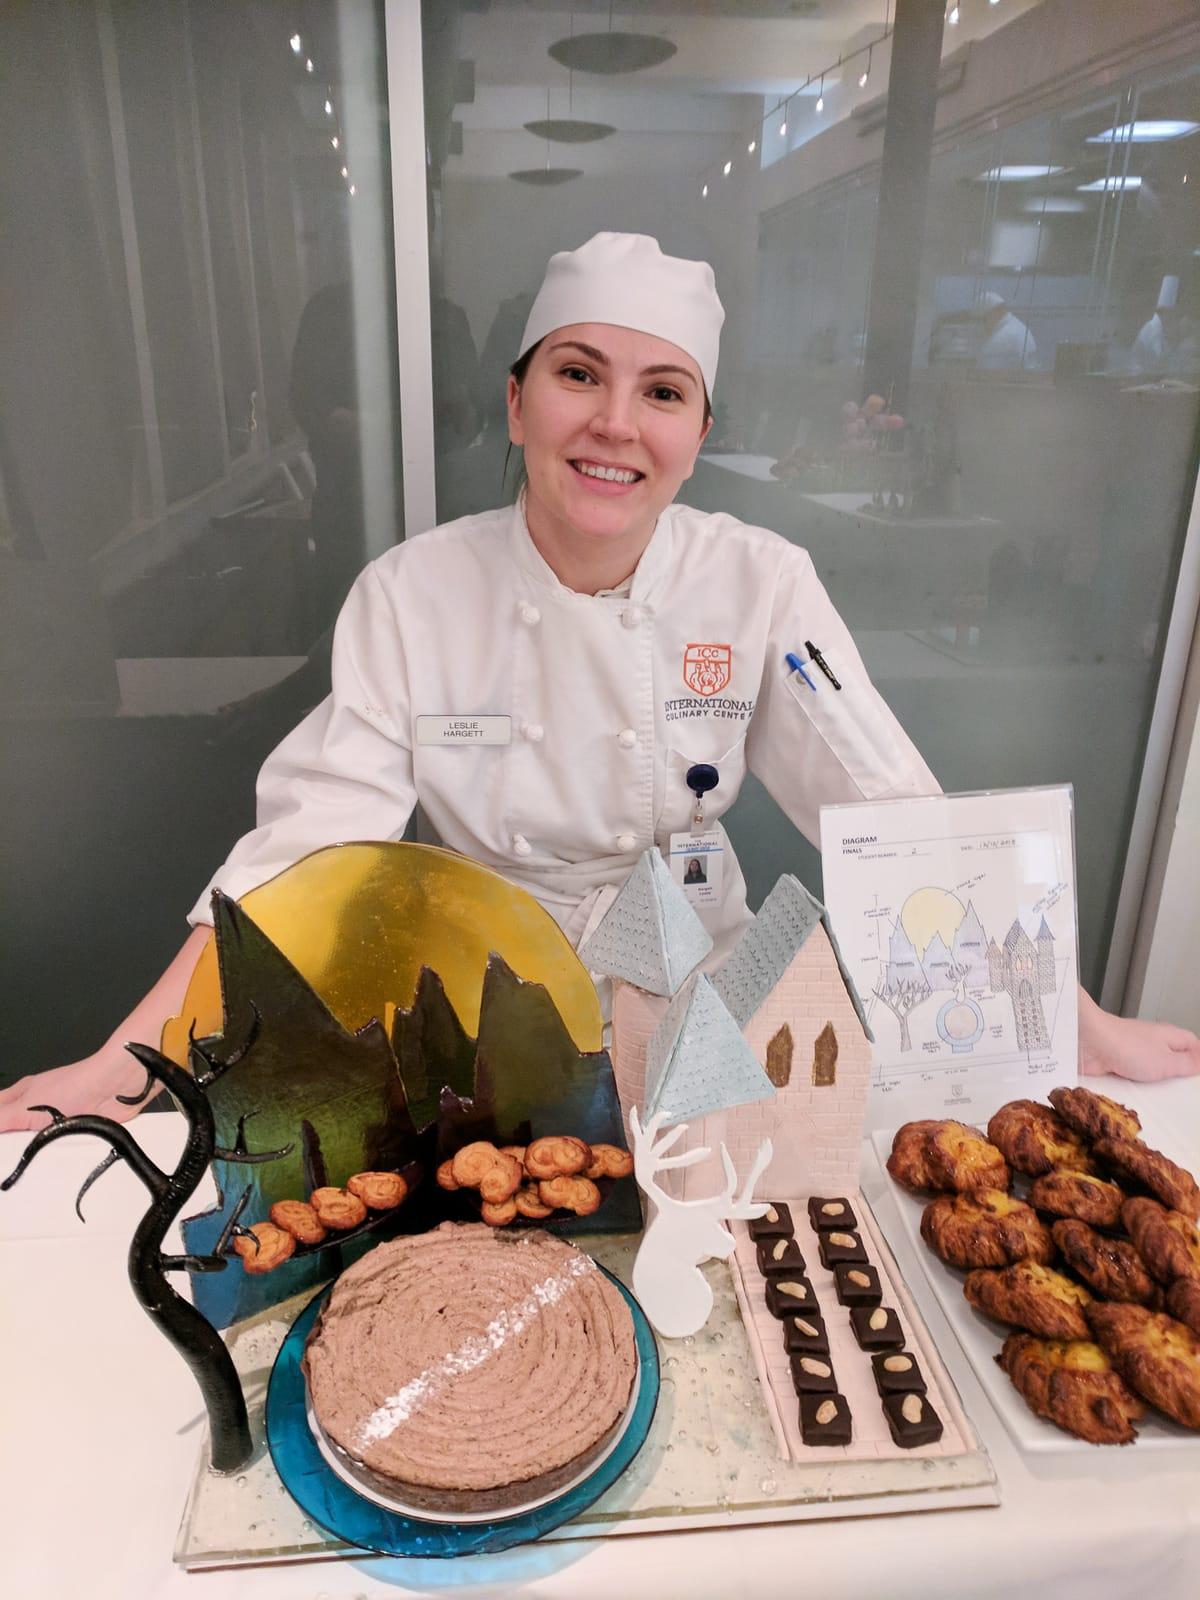 Girl in chef's uniform standing in front of showpiece